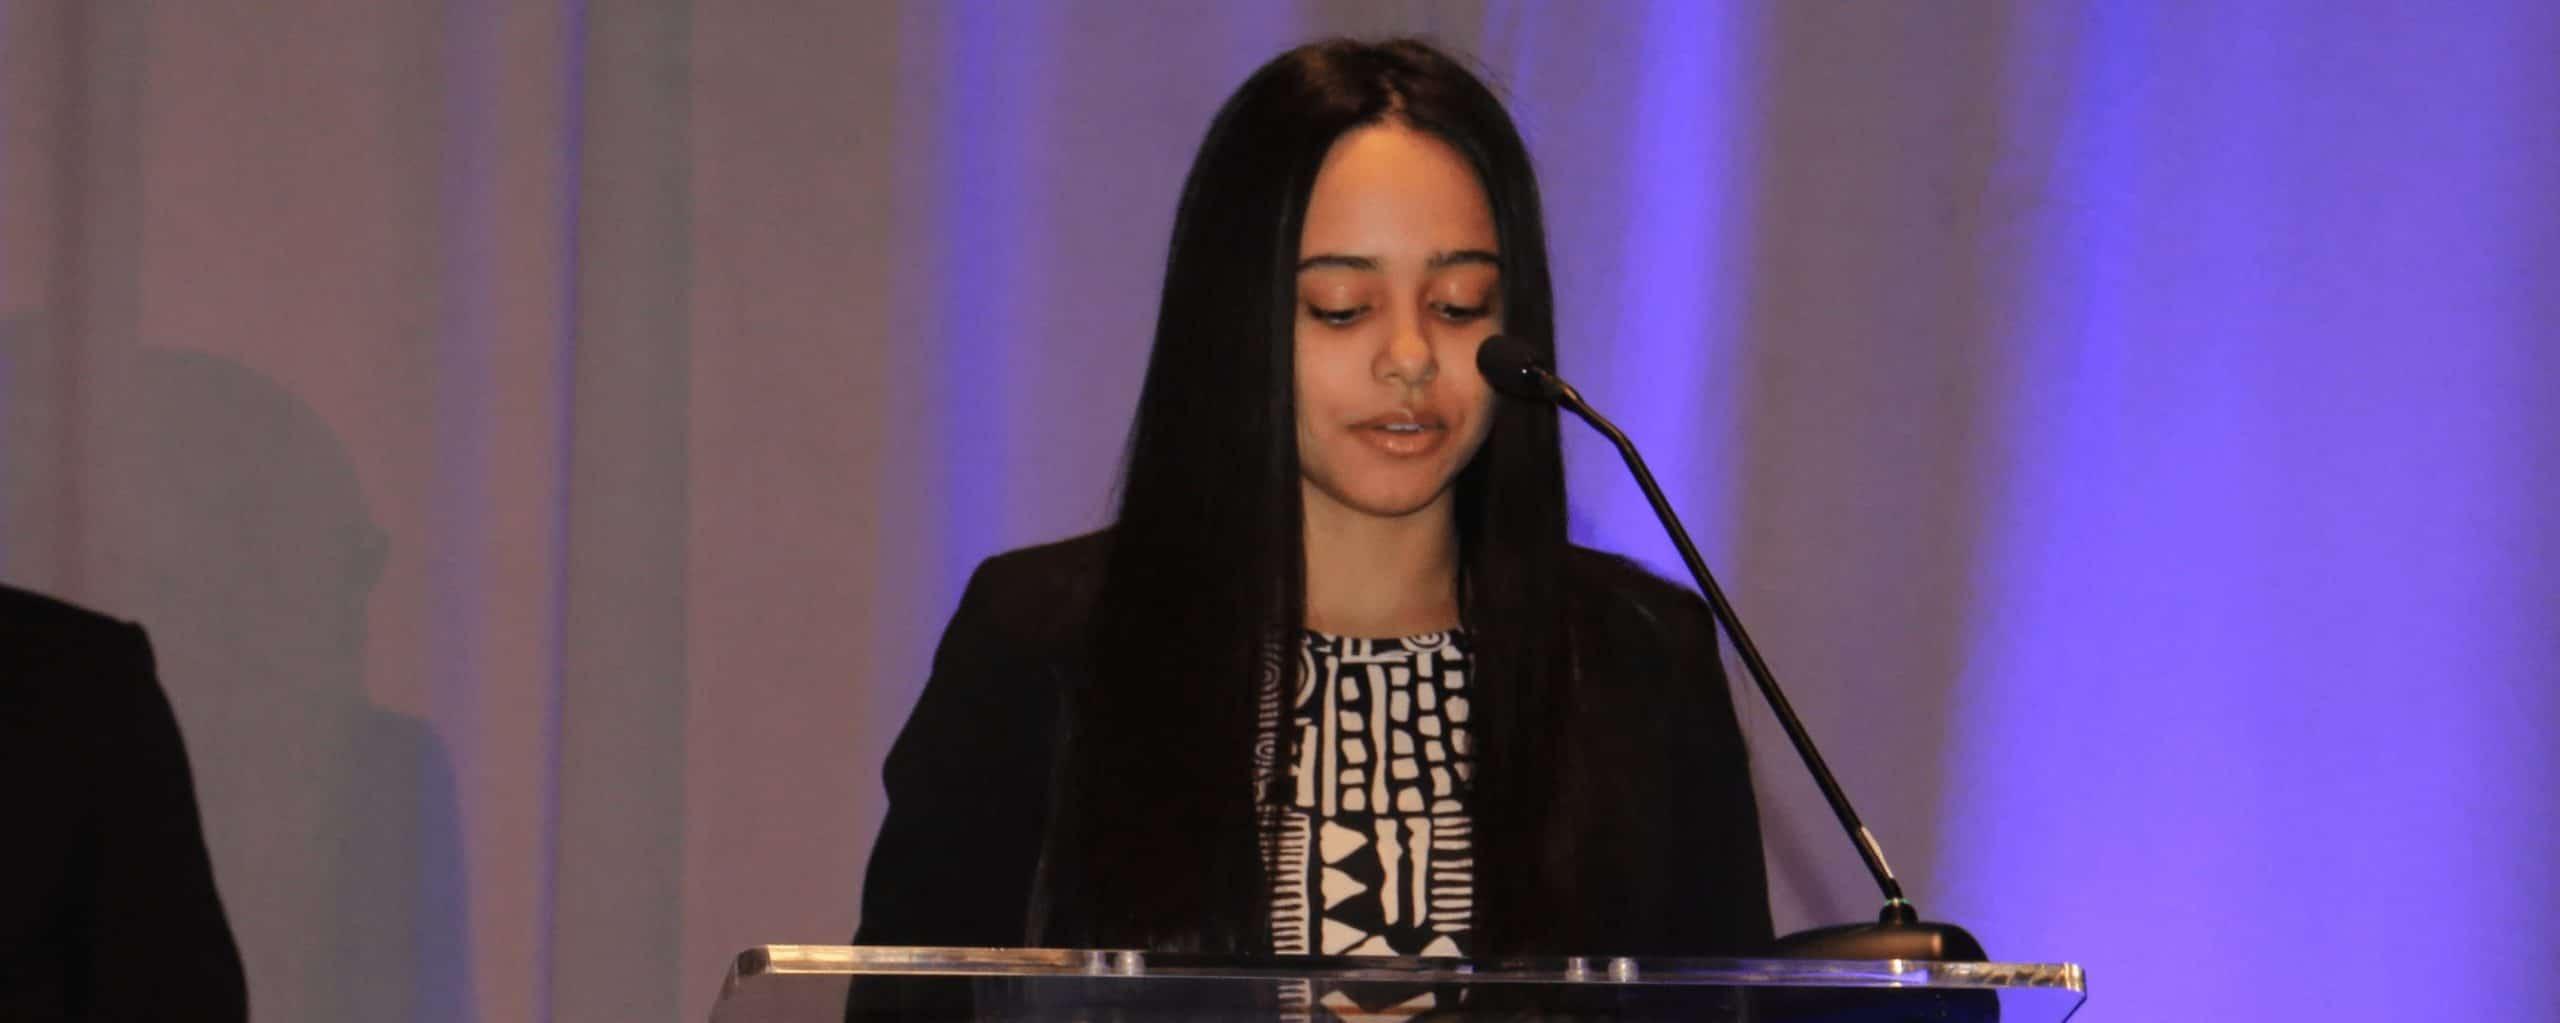 Ysaira speaking at SCOPE event